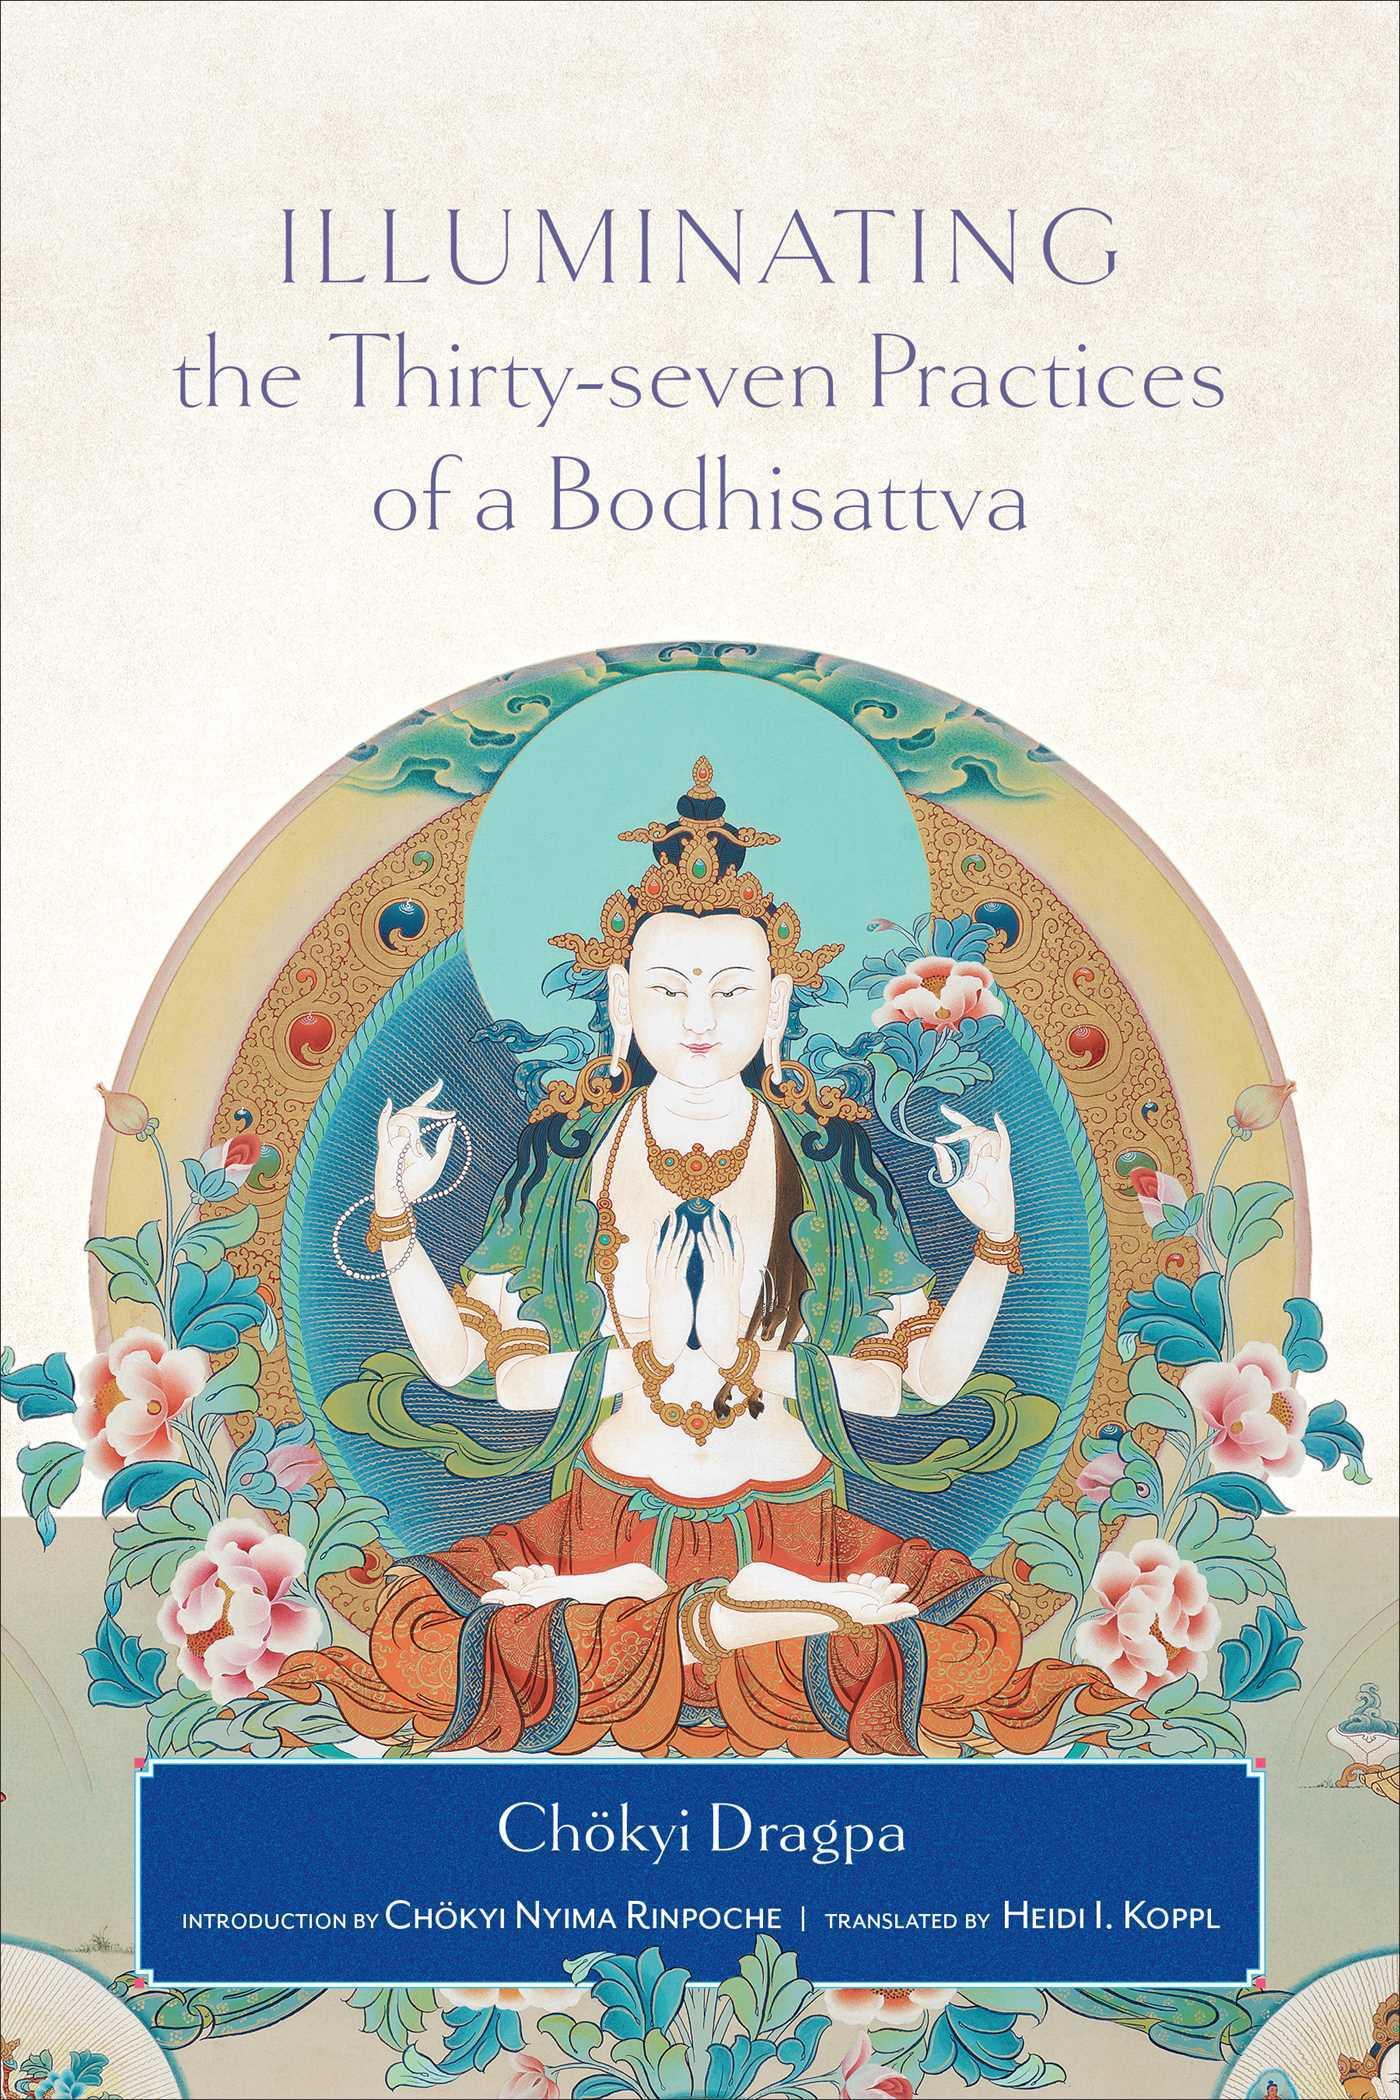 Illuminating the Thirty-Seven Practices of a Bodhisattva  by  Chokyi Dragpa